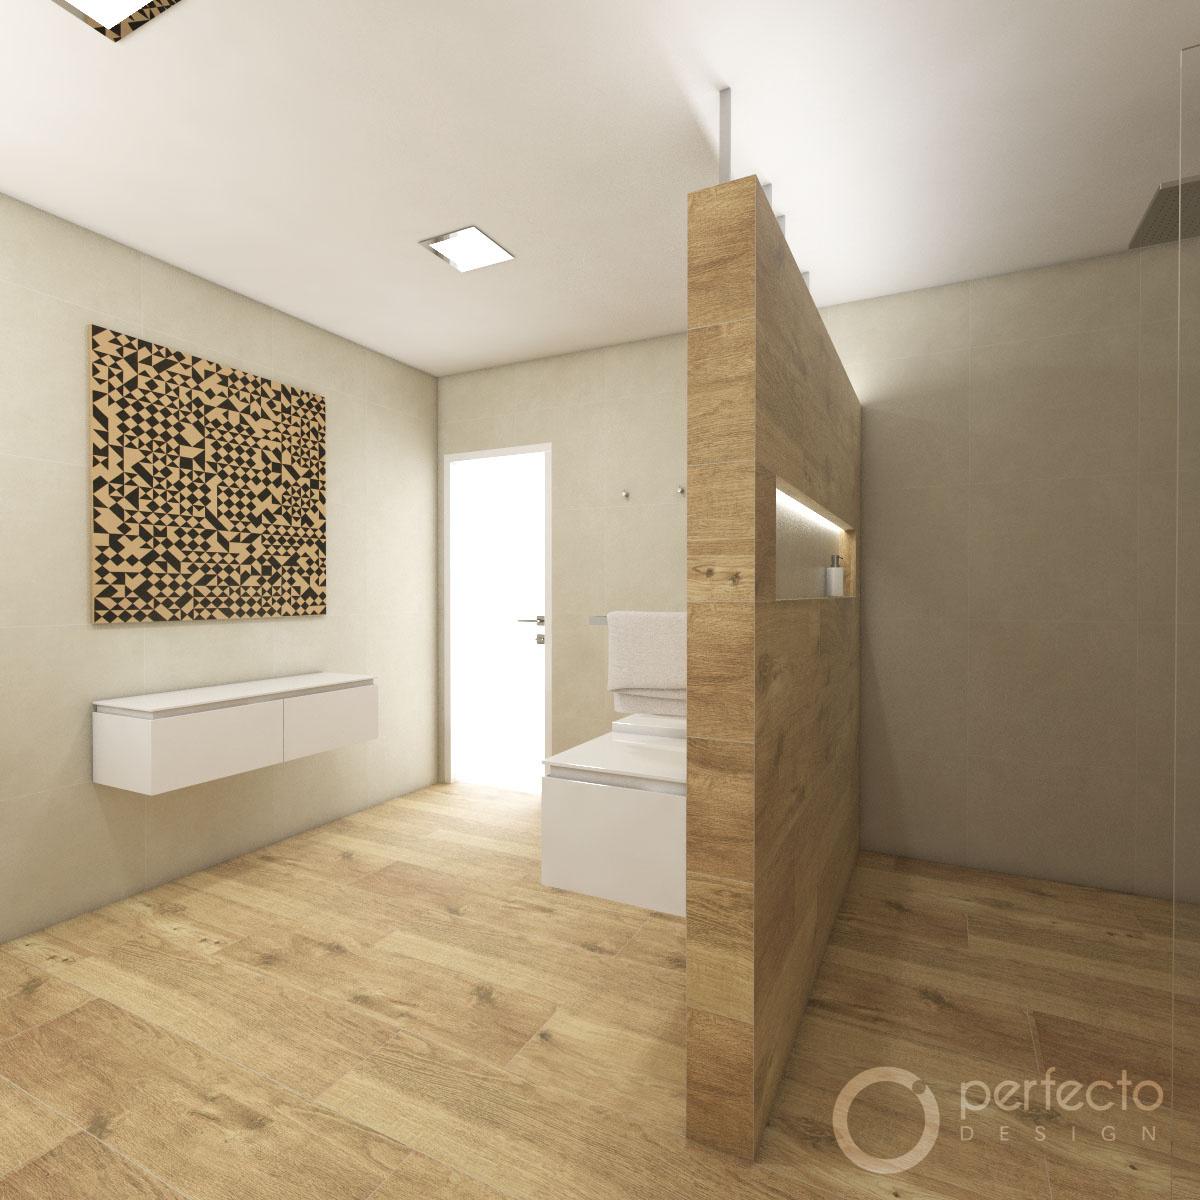 natur-badezimmer lara | perfecto design, Badezimmer